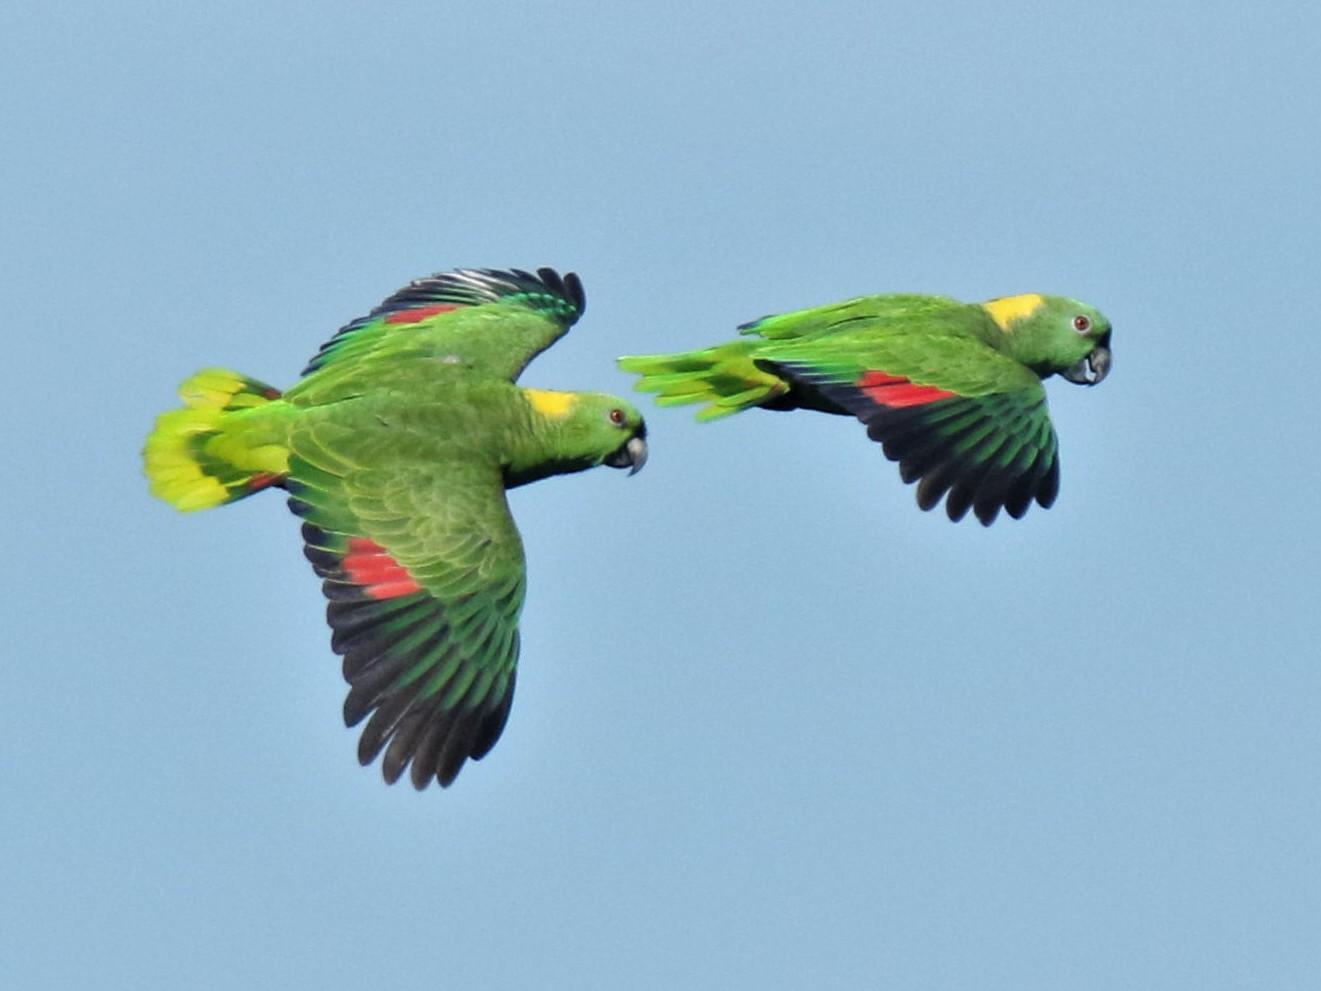 Yellow-naped Parrot - Josue  de León Lux (Birding Guide) josuedeleonlux@gmail.com +502 3068 8988